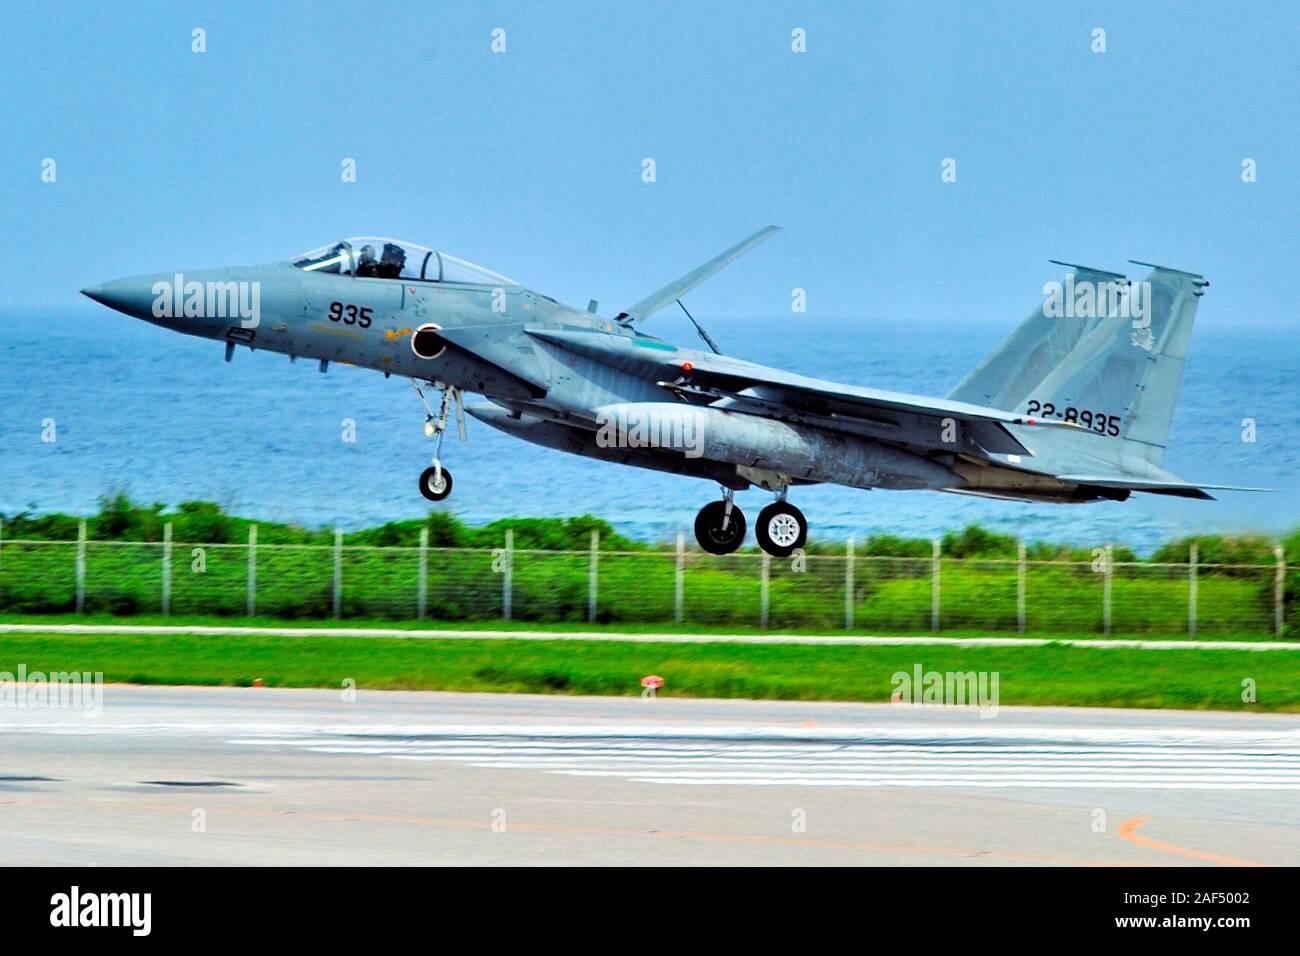 Japan Air Self-Defense Force Mitsubishi F-15J, Landing After Patrol, Naha Airport, Okinawa, Japan Stock Photo